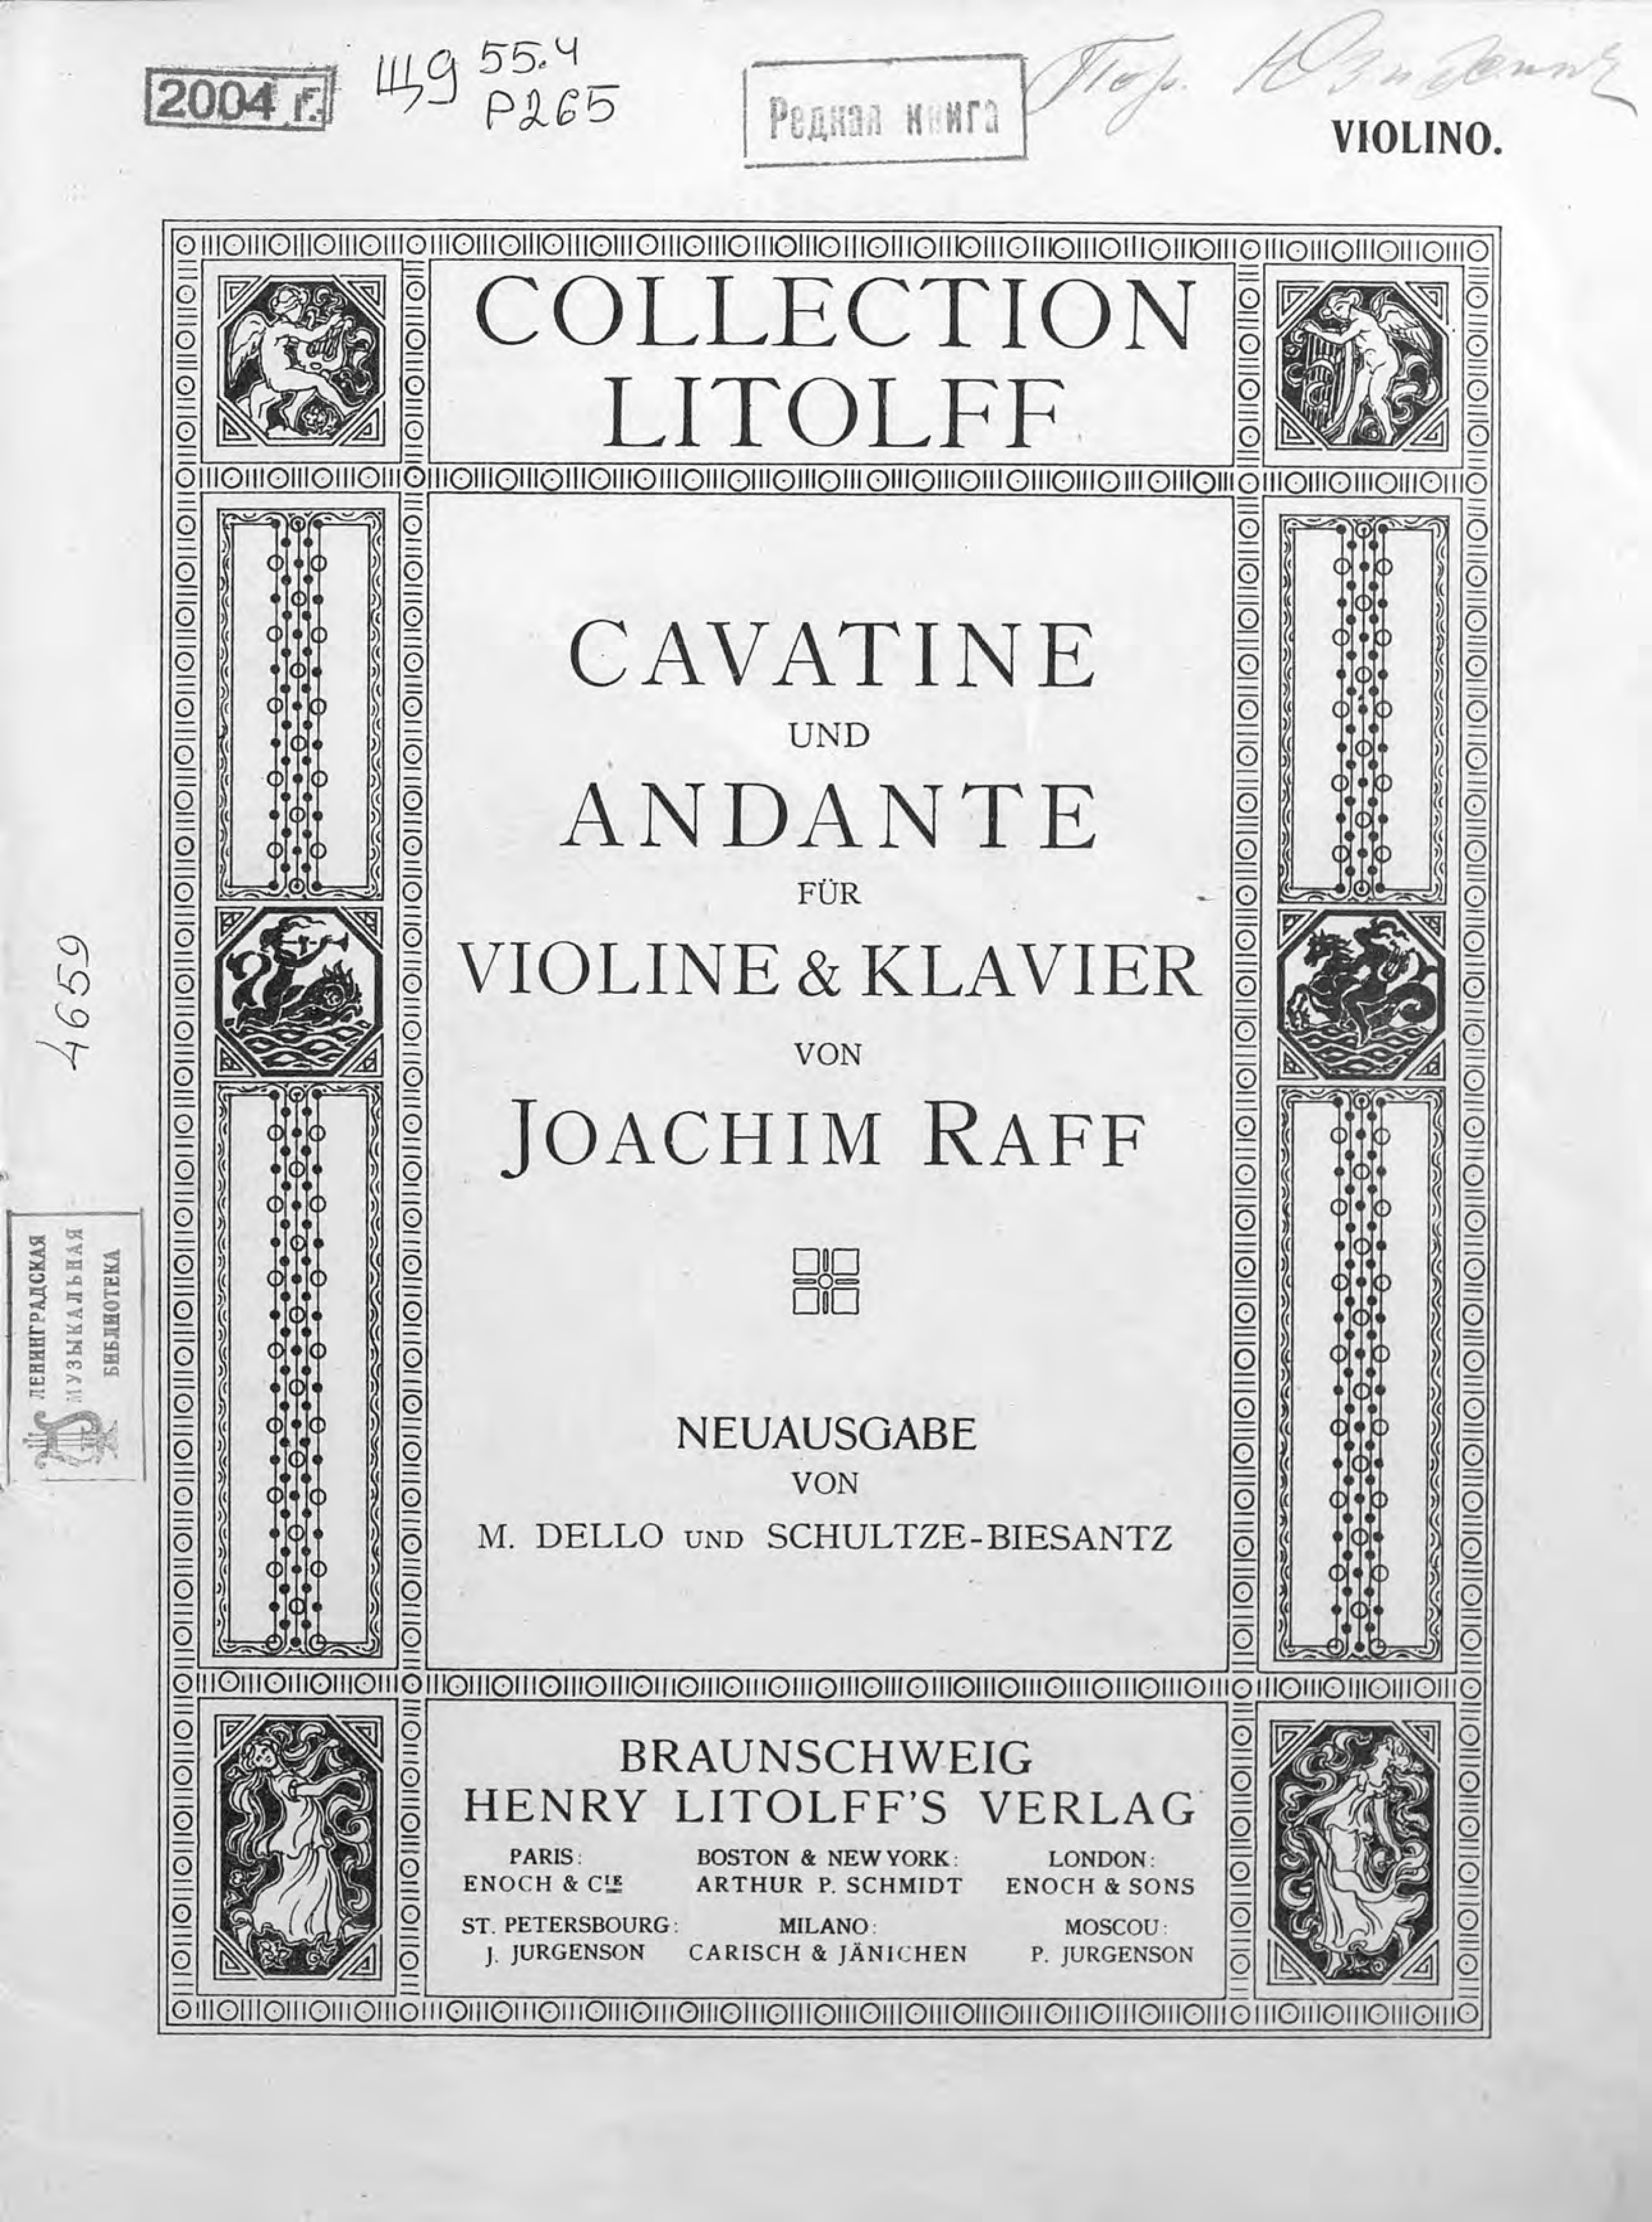 Йозеф Иоахим Рафф Cavatine, op. 85, № 3 und Andante fur violine & Klavier von J. Raff цена и фото